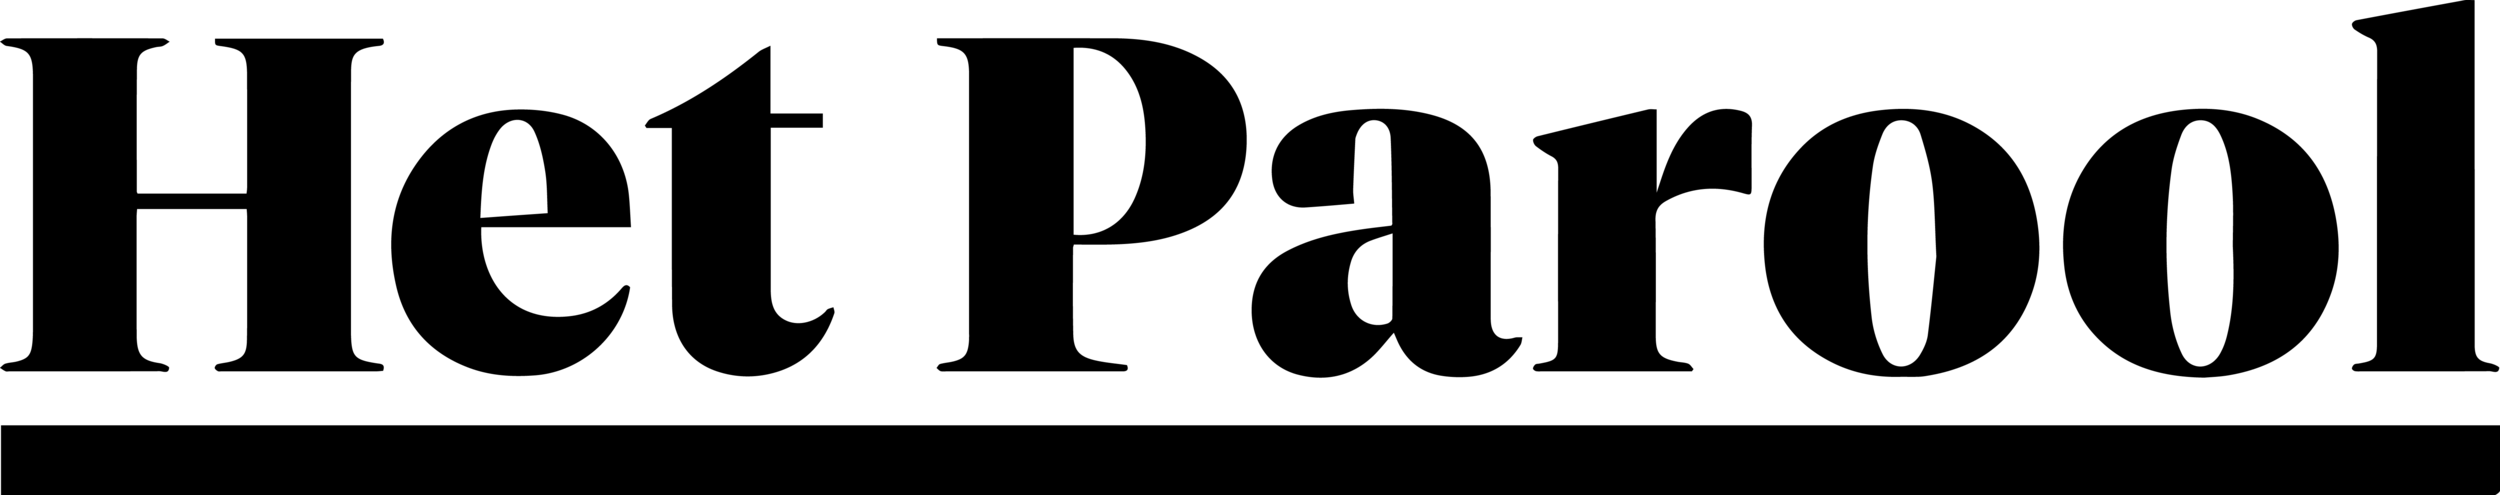 het parool logo.png